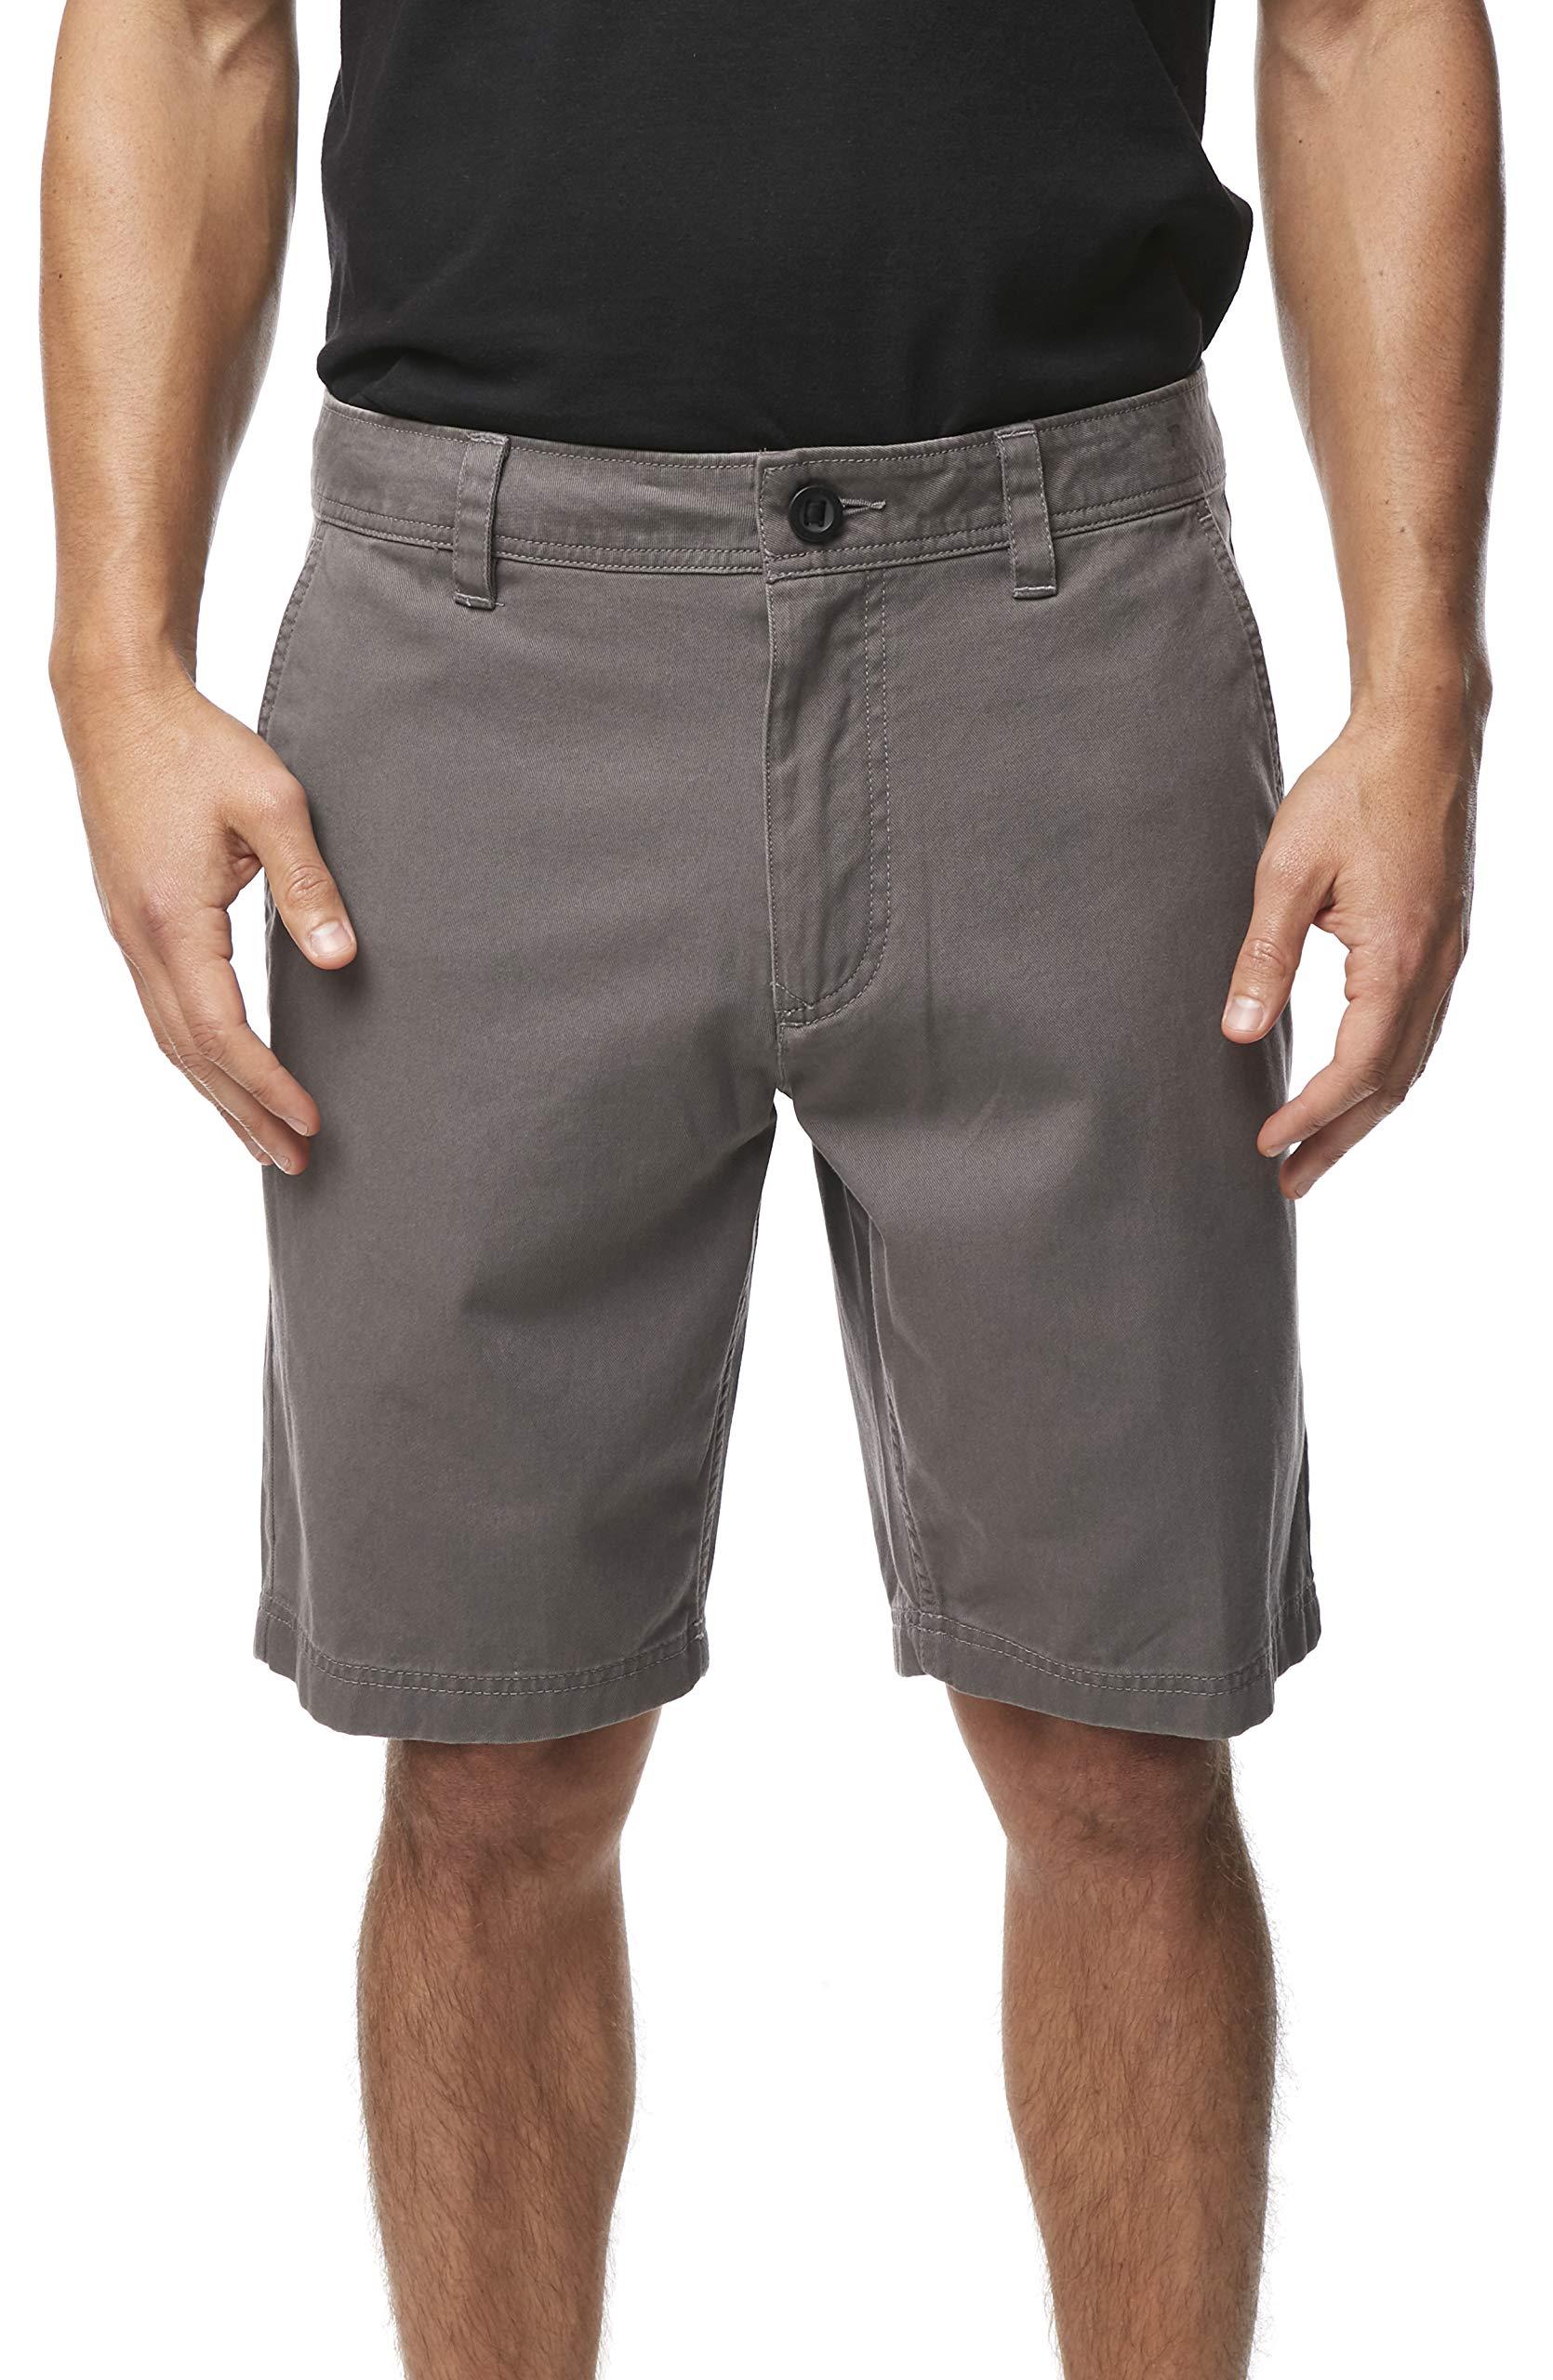 O'NEILL Men's Standard Fit Walk Short, 20 Inch Outseam | Mid-Length Short |